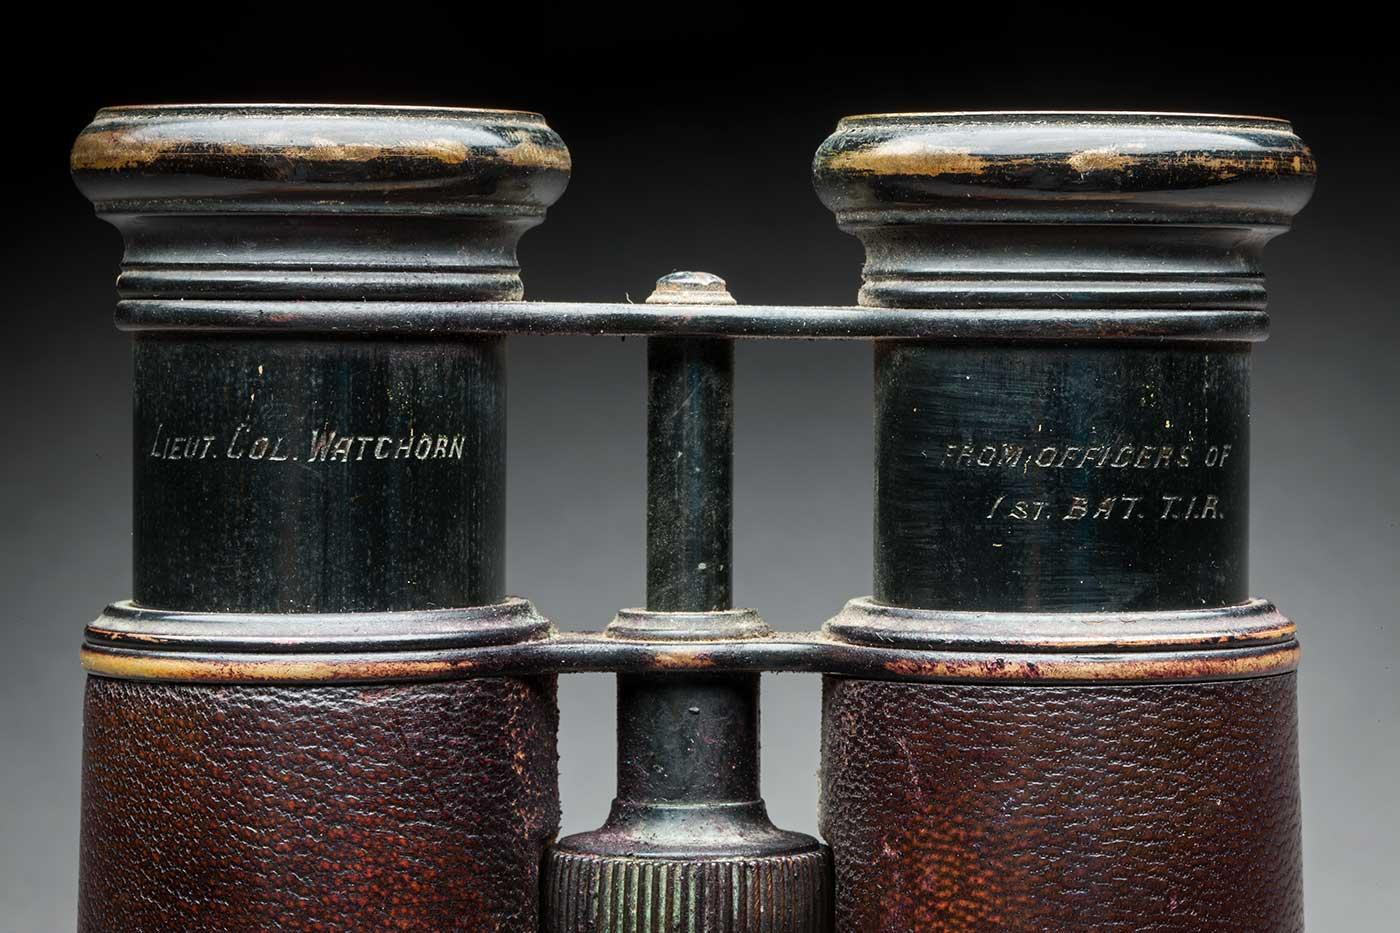 Detail image showing top part of binoculars engraved 'Lieut. Col. Watchorn'